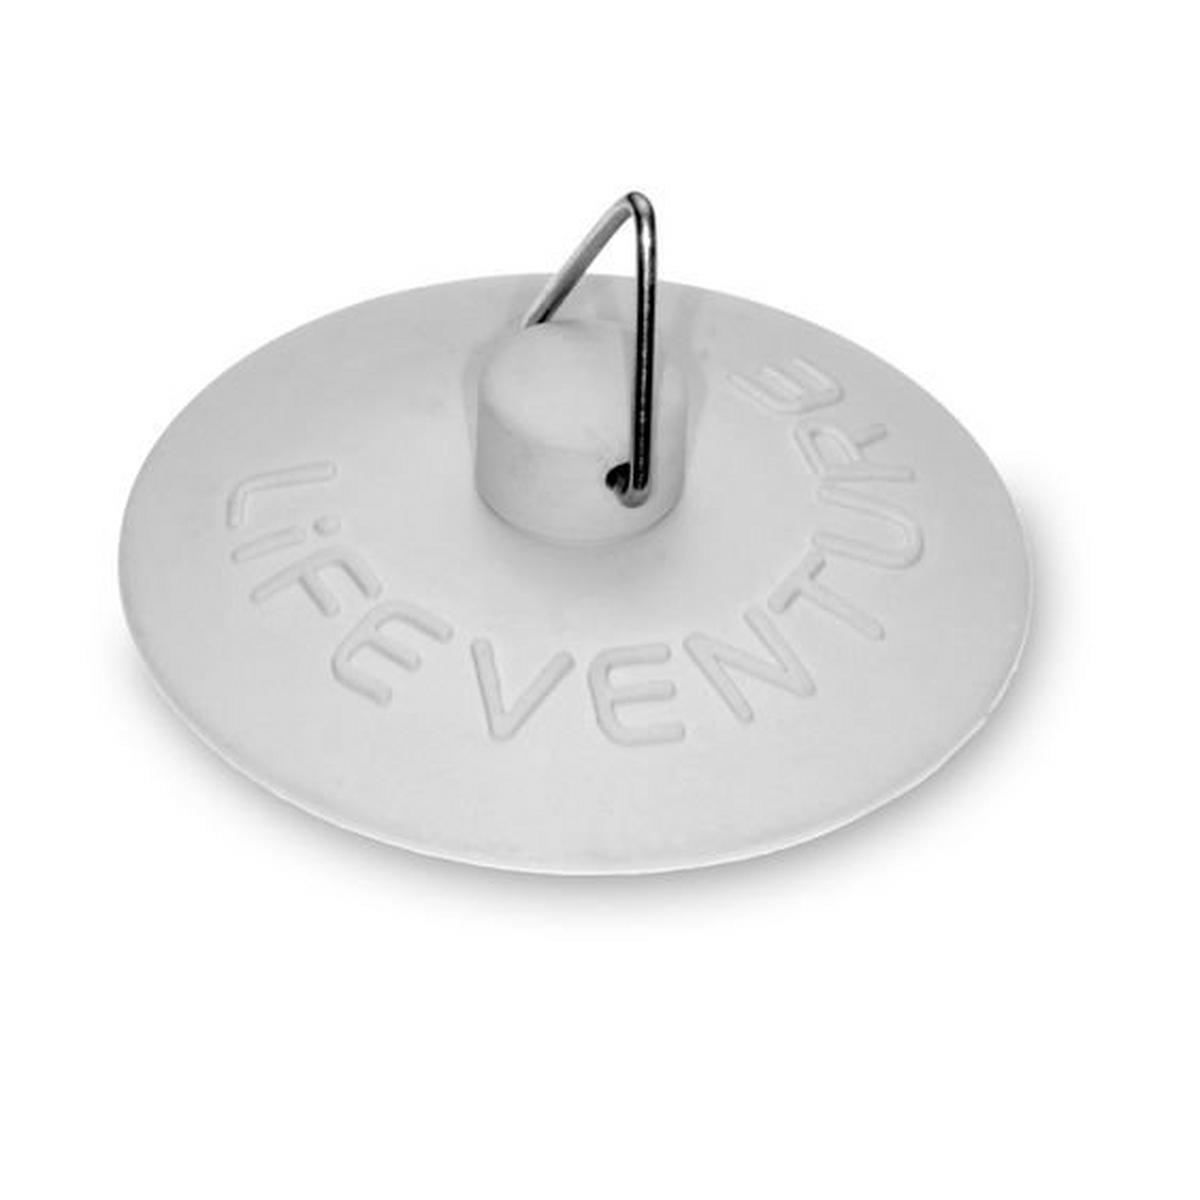 Lifeventure Travel Bath/Sink Plug